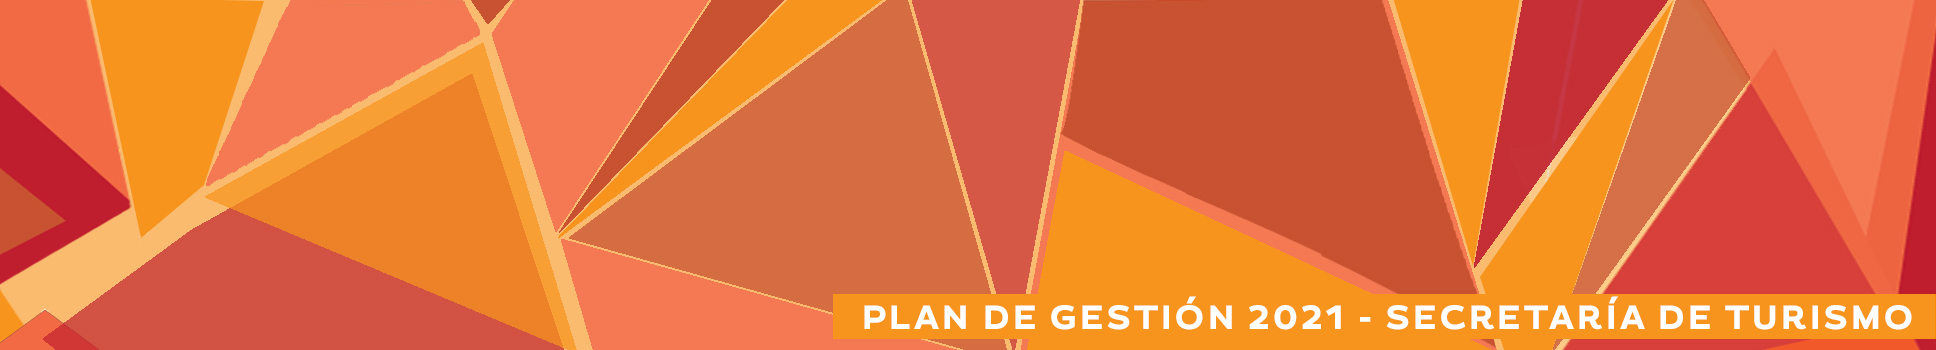 plan-de-accion-2.jpg